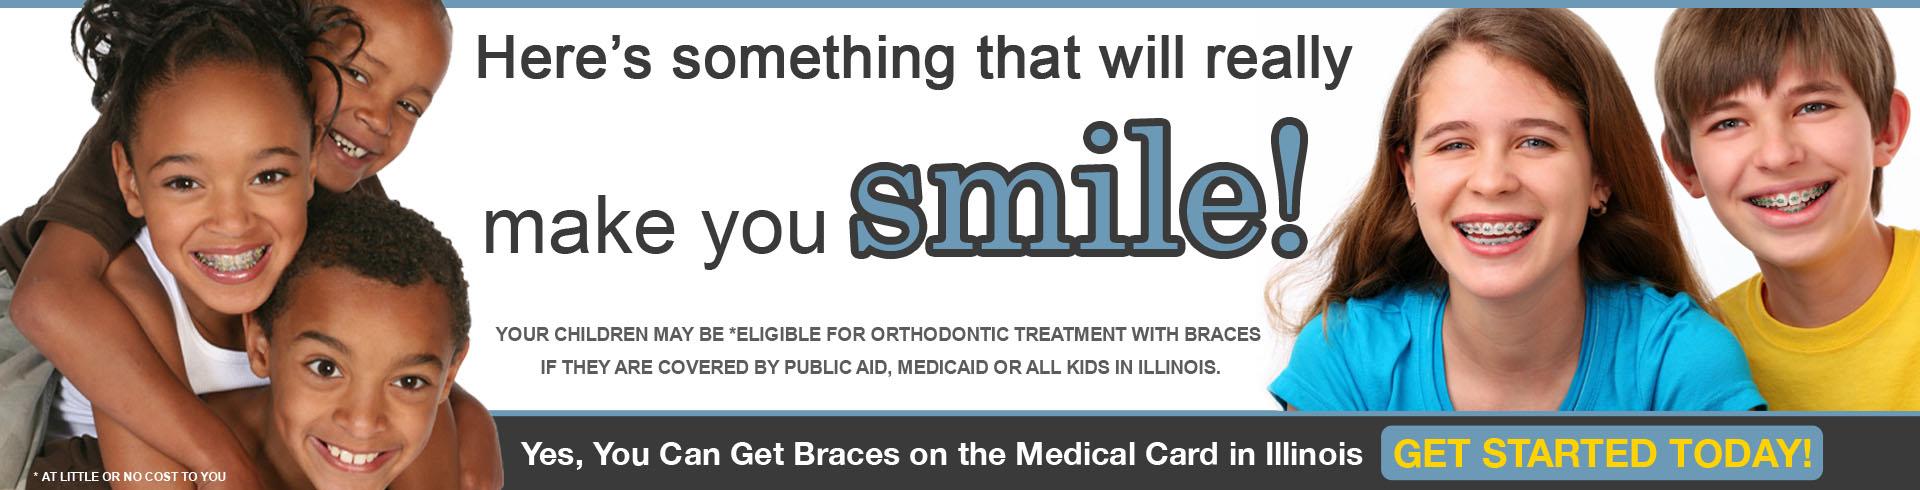 medicaid orthodontist medical card braces frenos con tarjeta medica